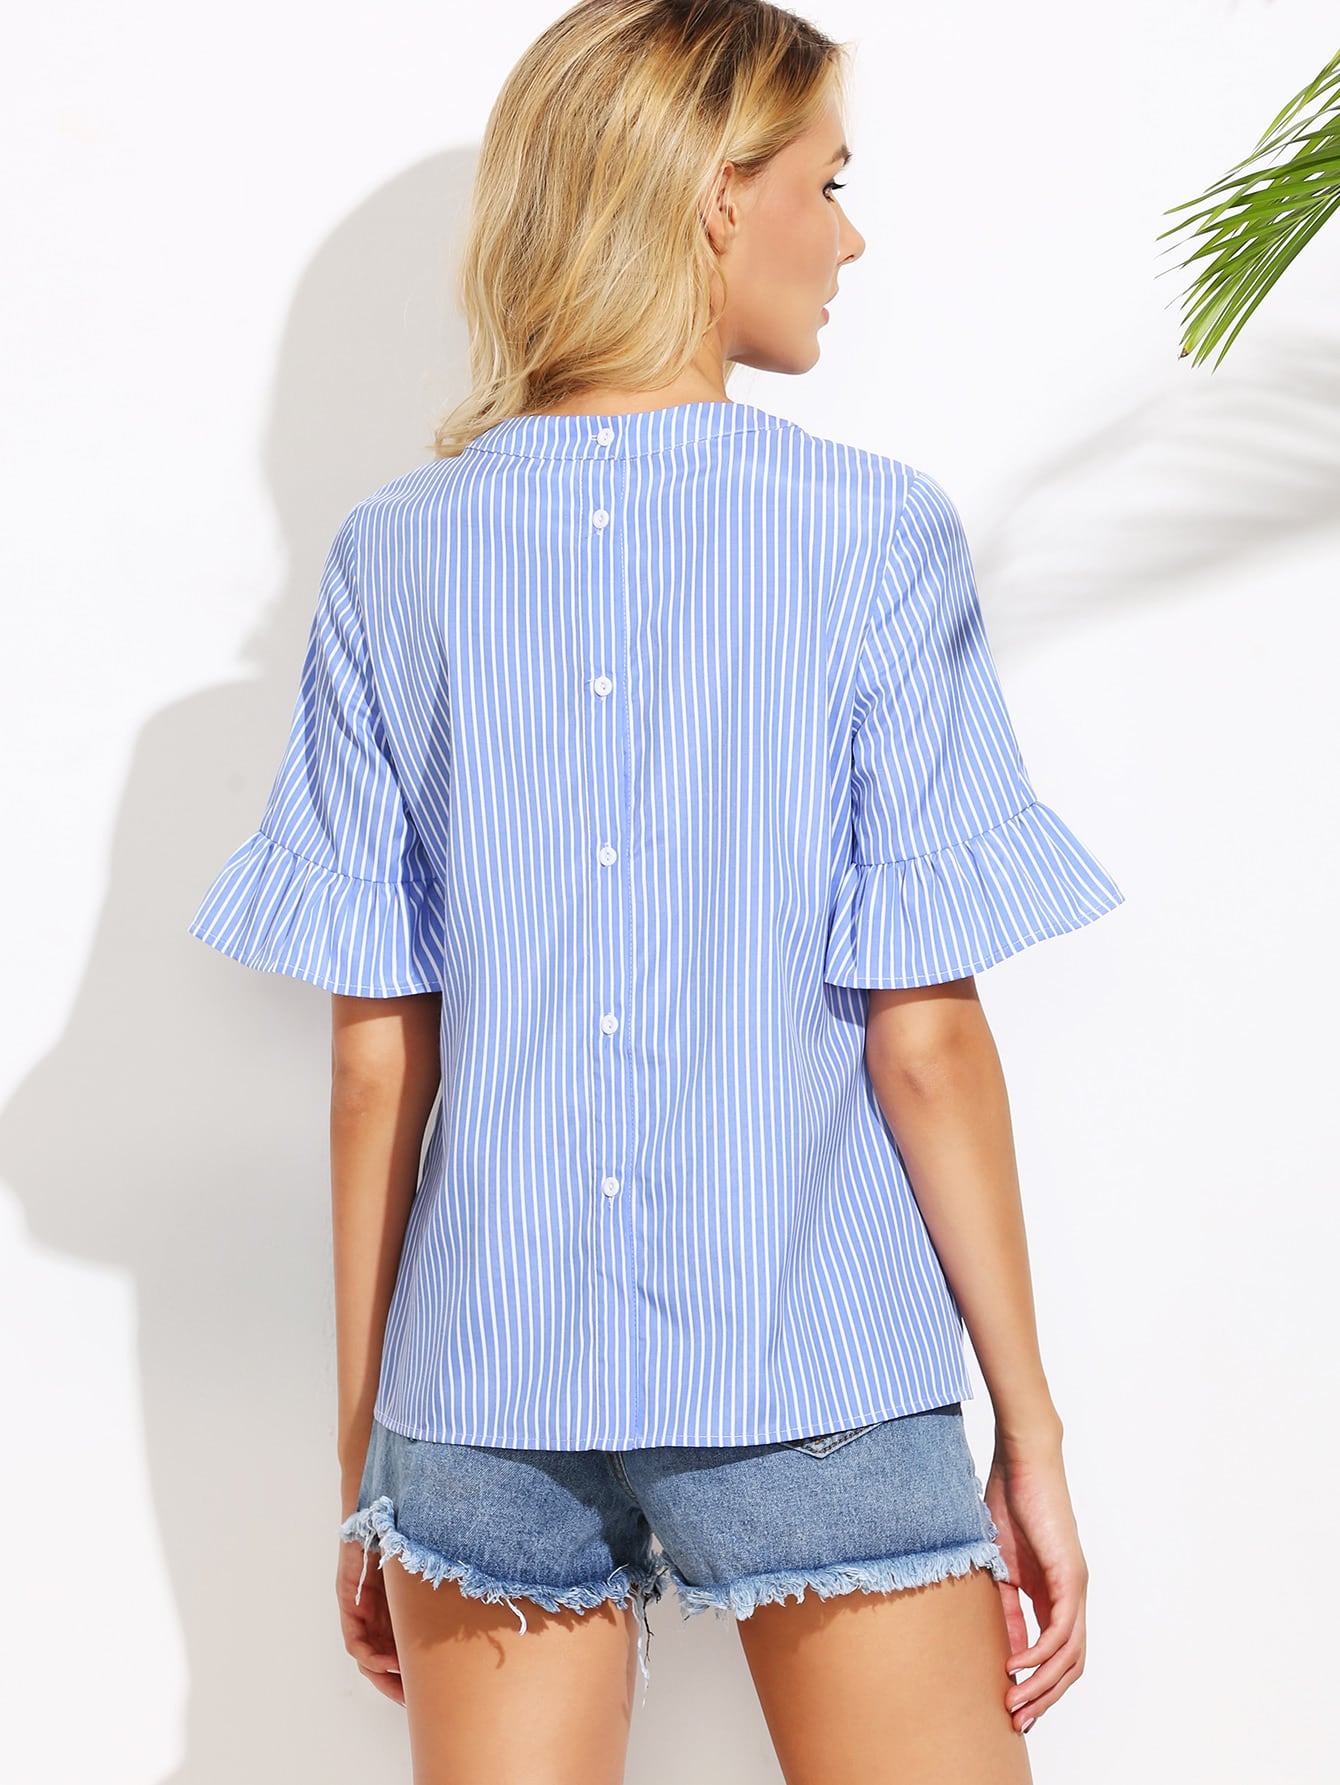 blouse160819701_2